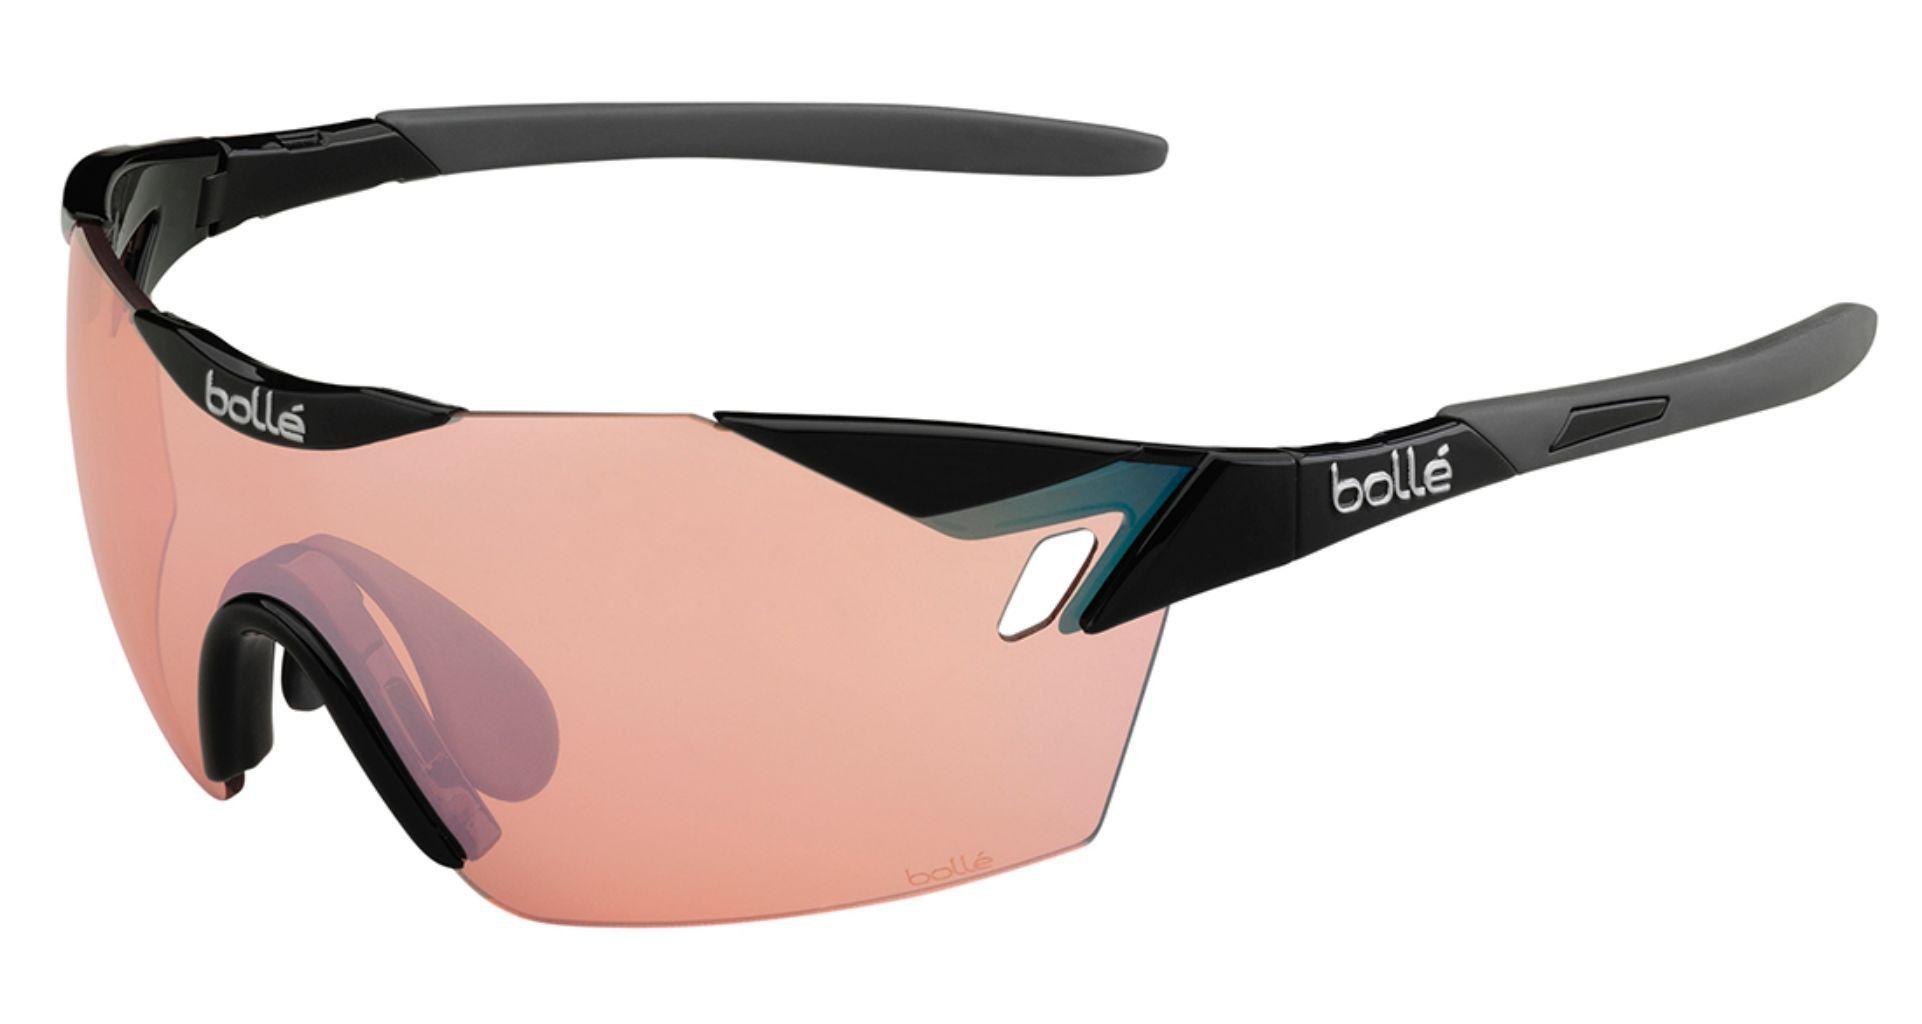 Bolle 6th sense sunglasses sunglasses cycling